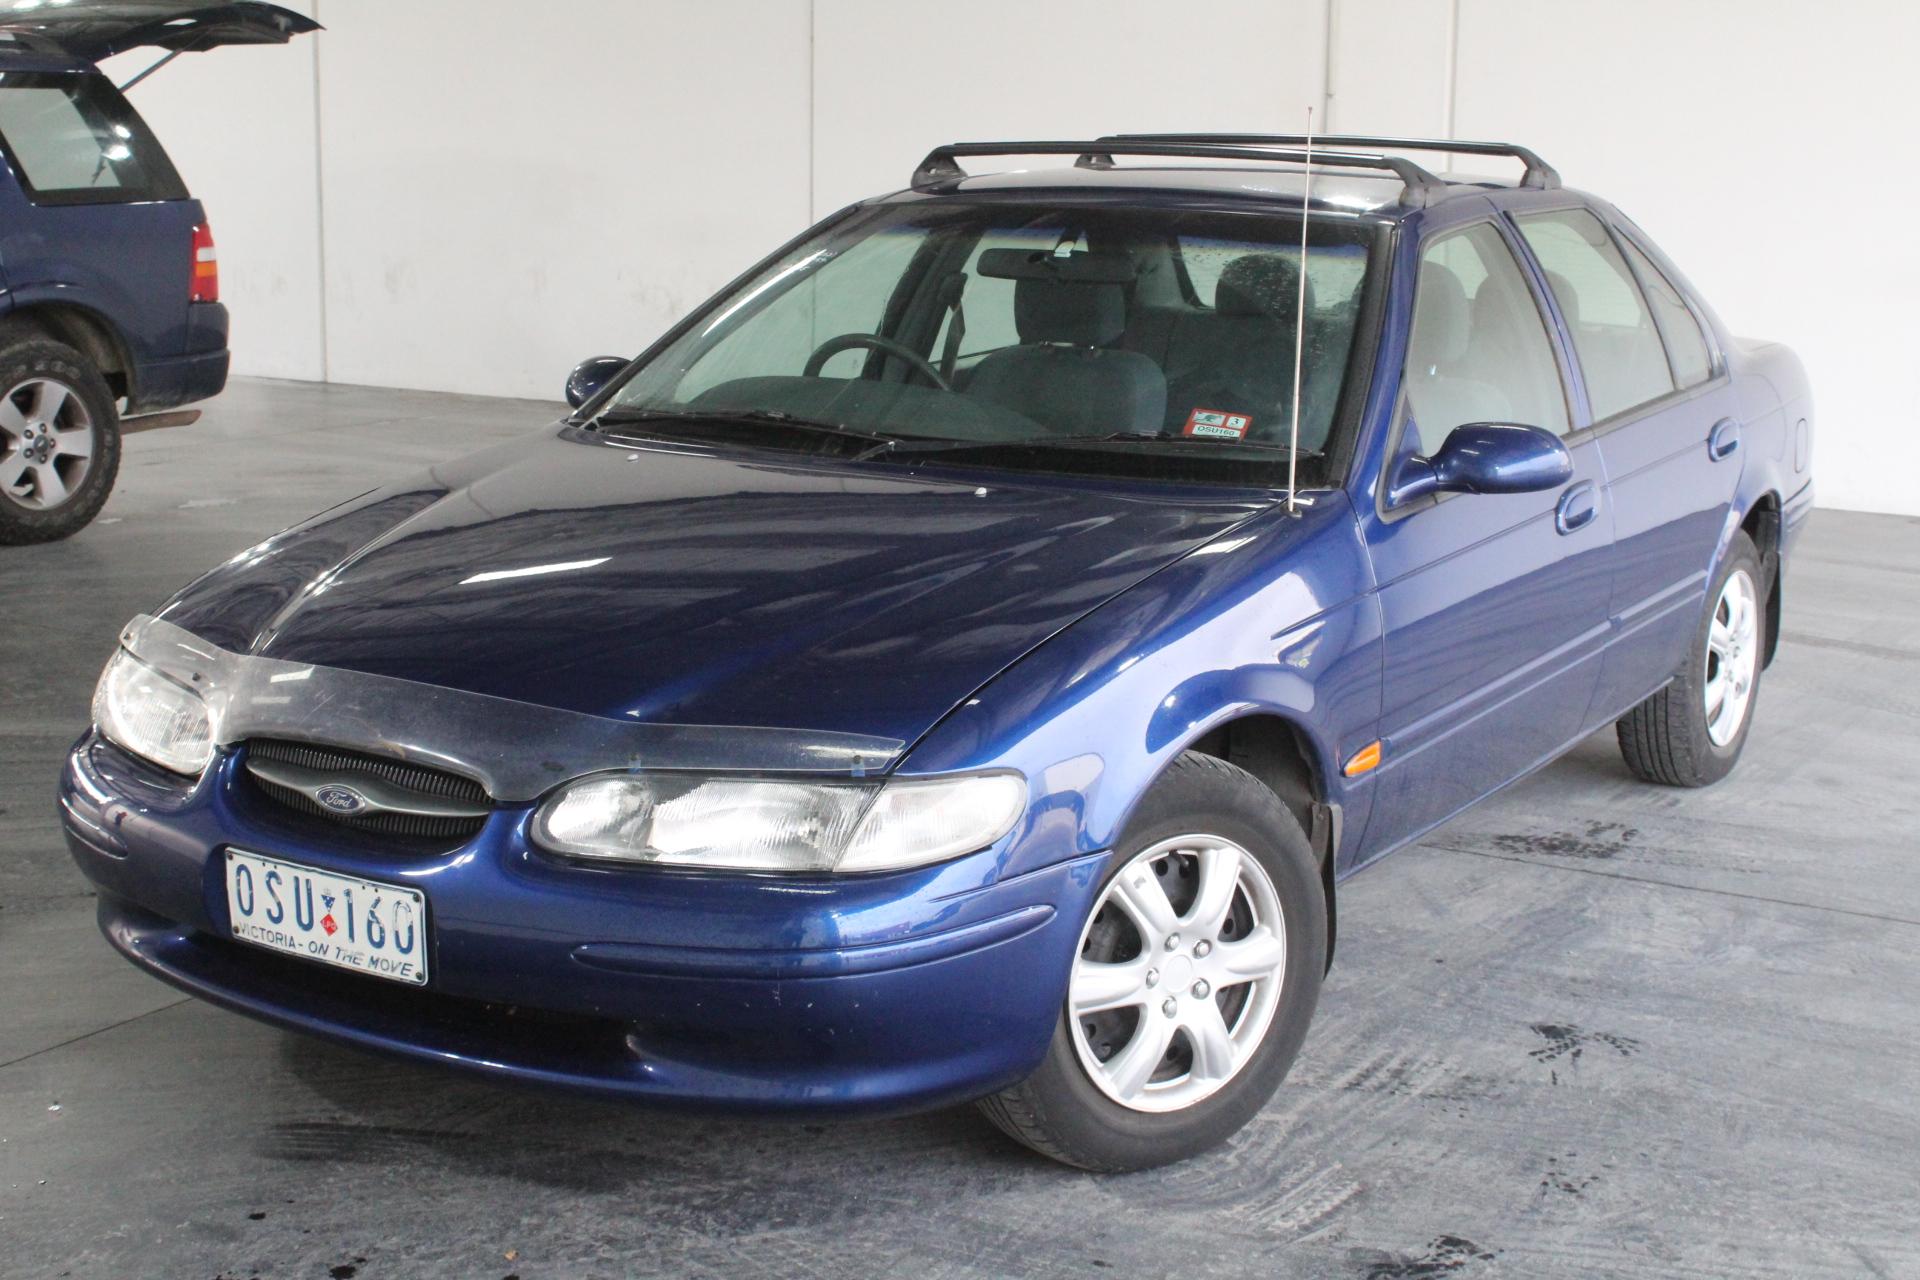 1998 Ford Falcon Futura EL Automatic Sedan-Dual Fuel